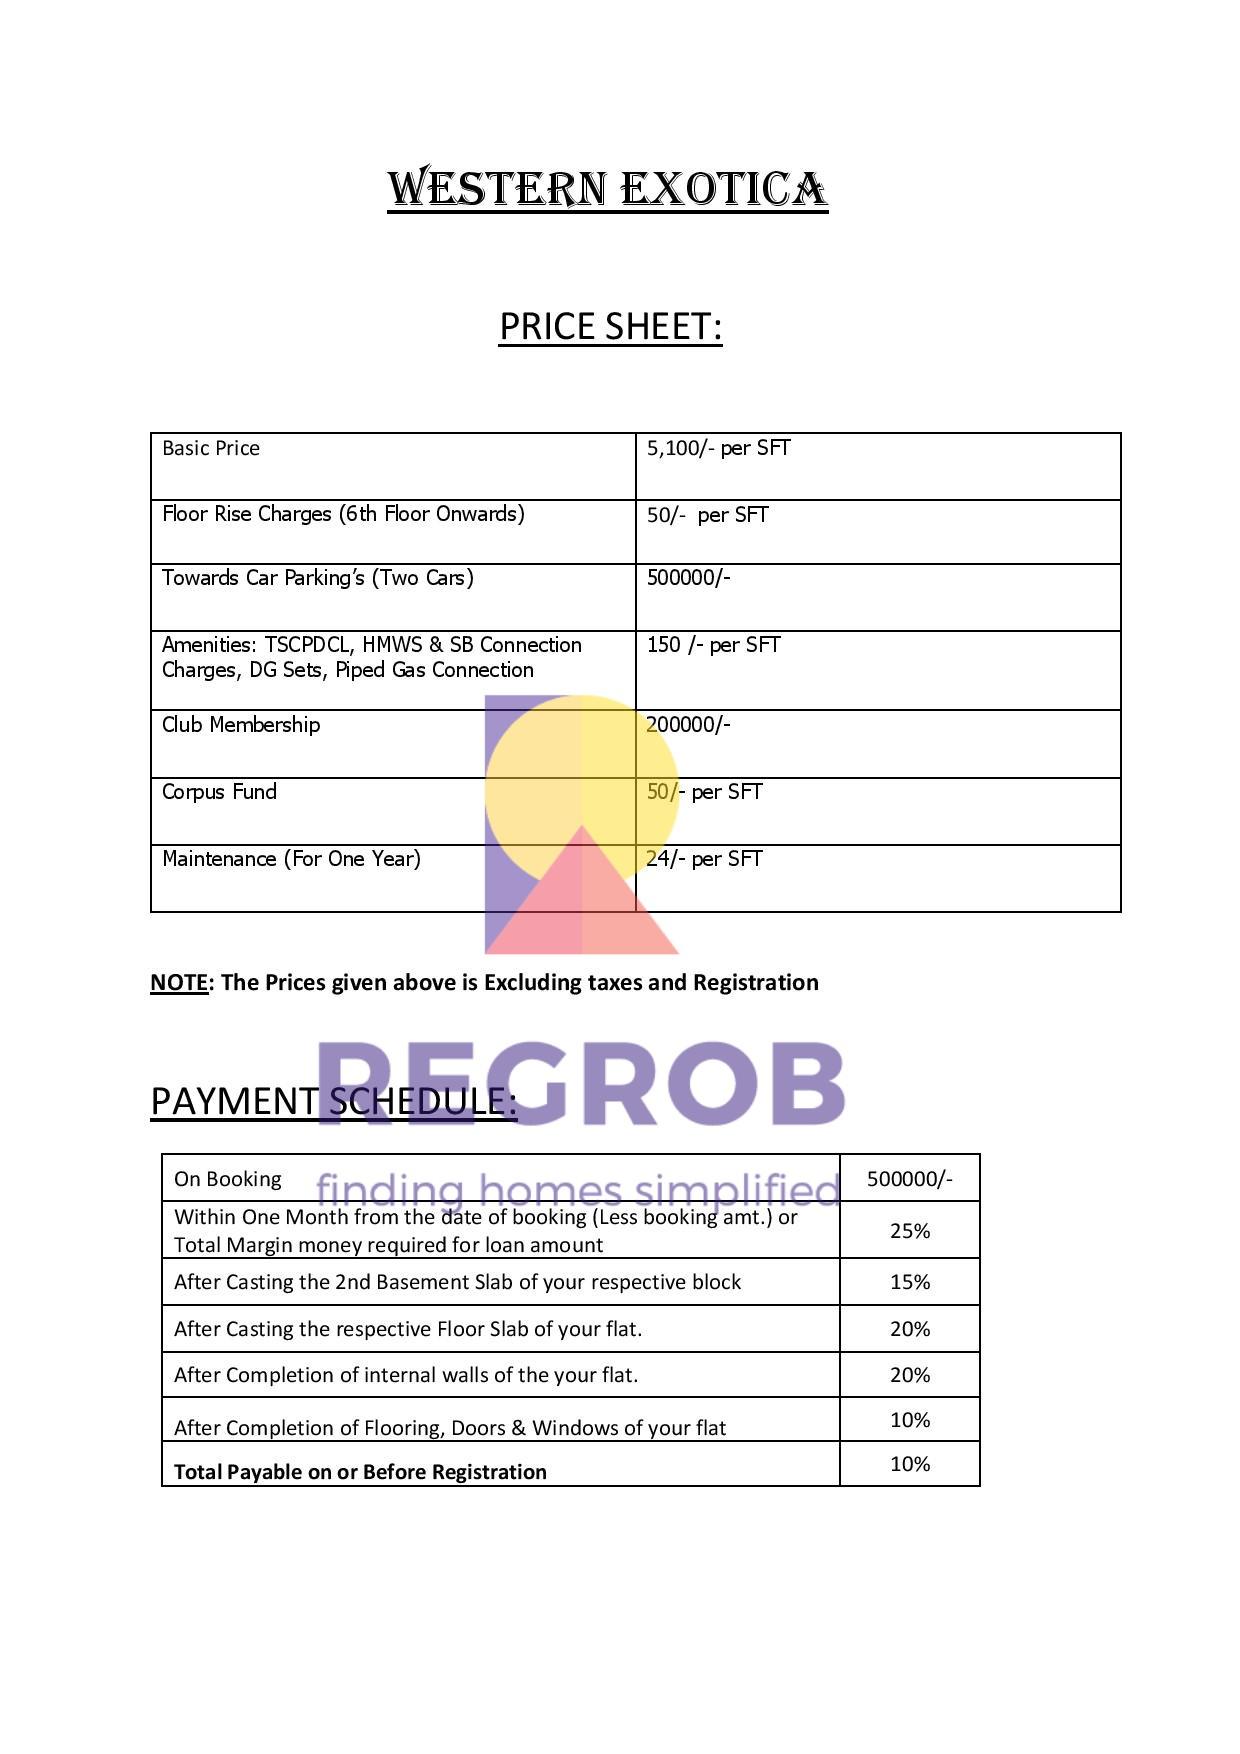 Western Exotica Price Sheet